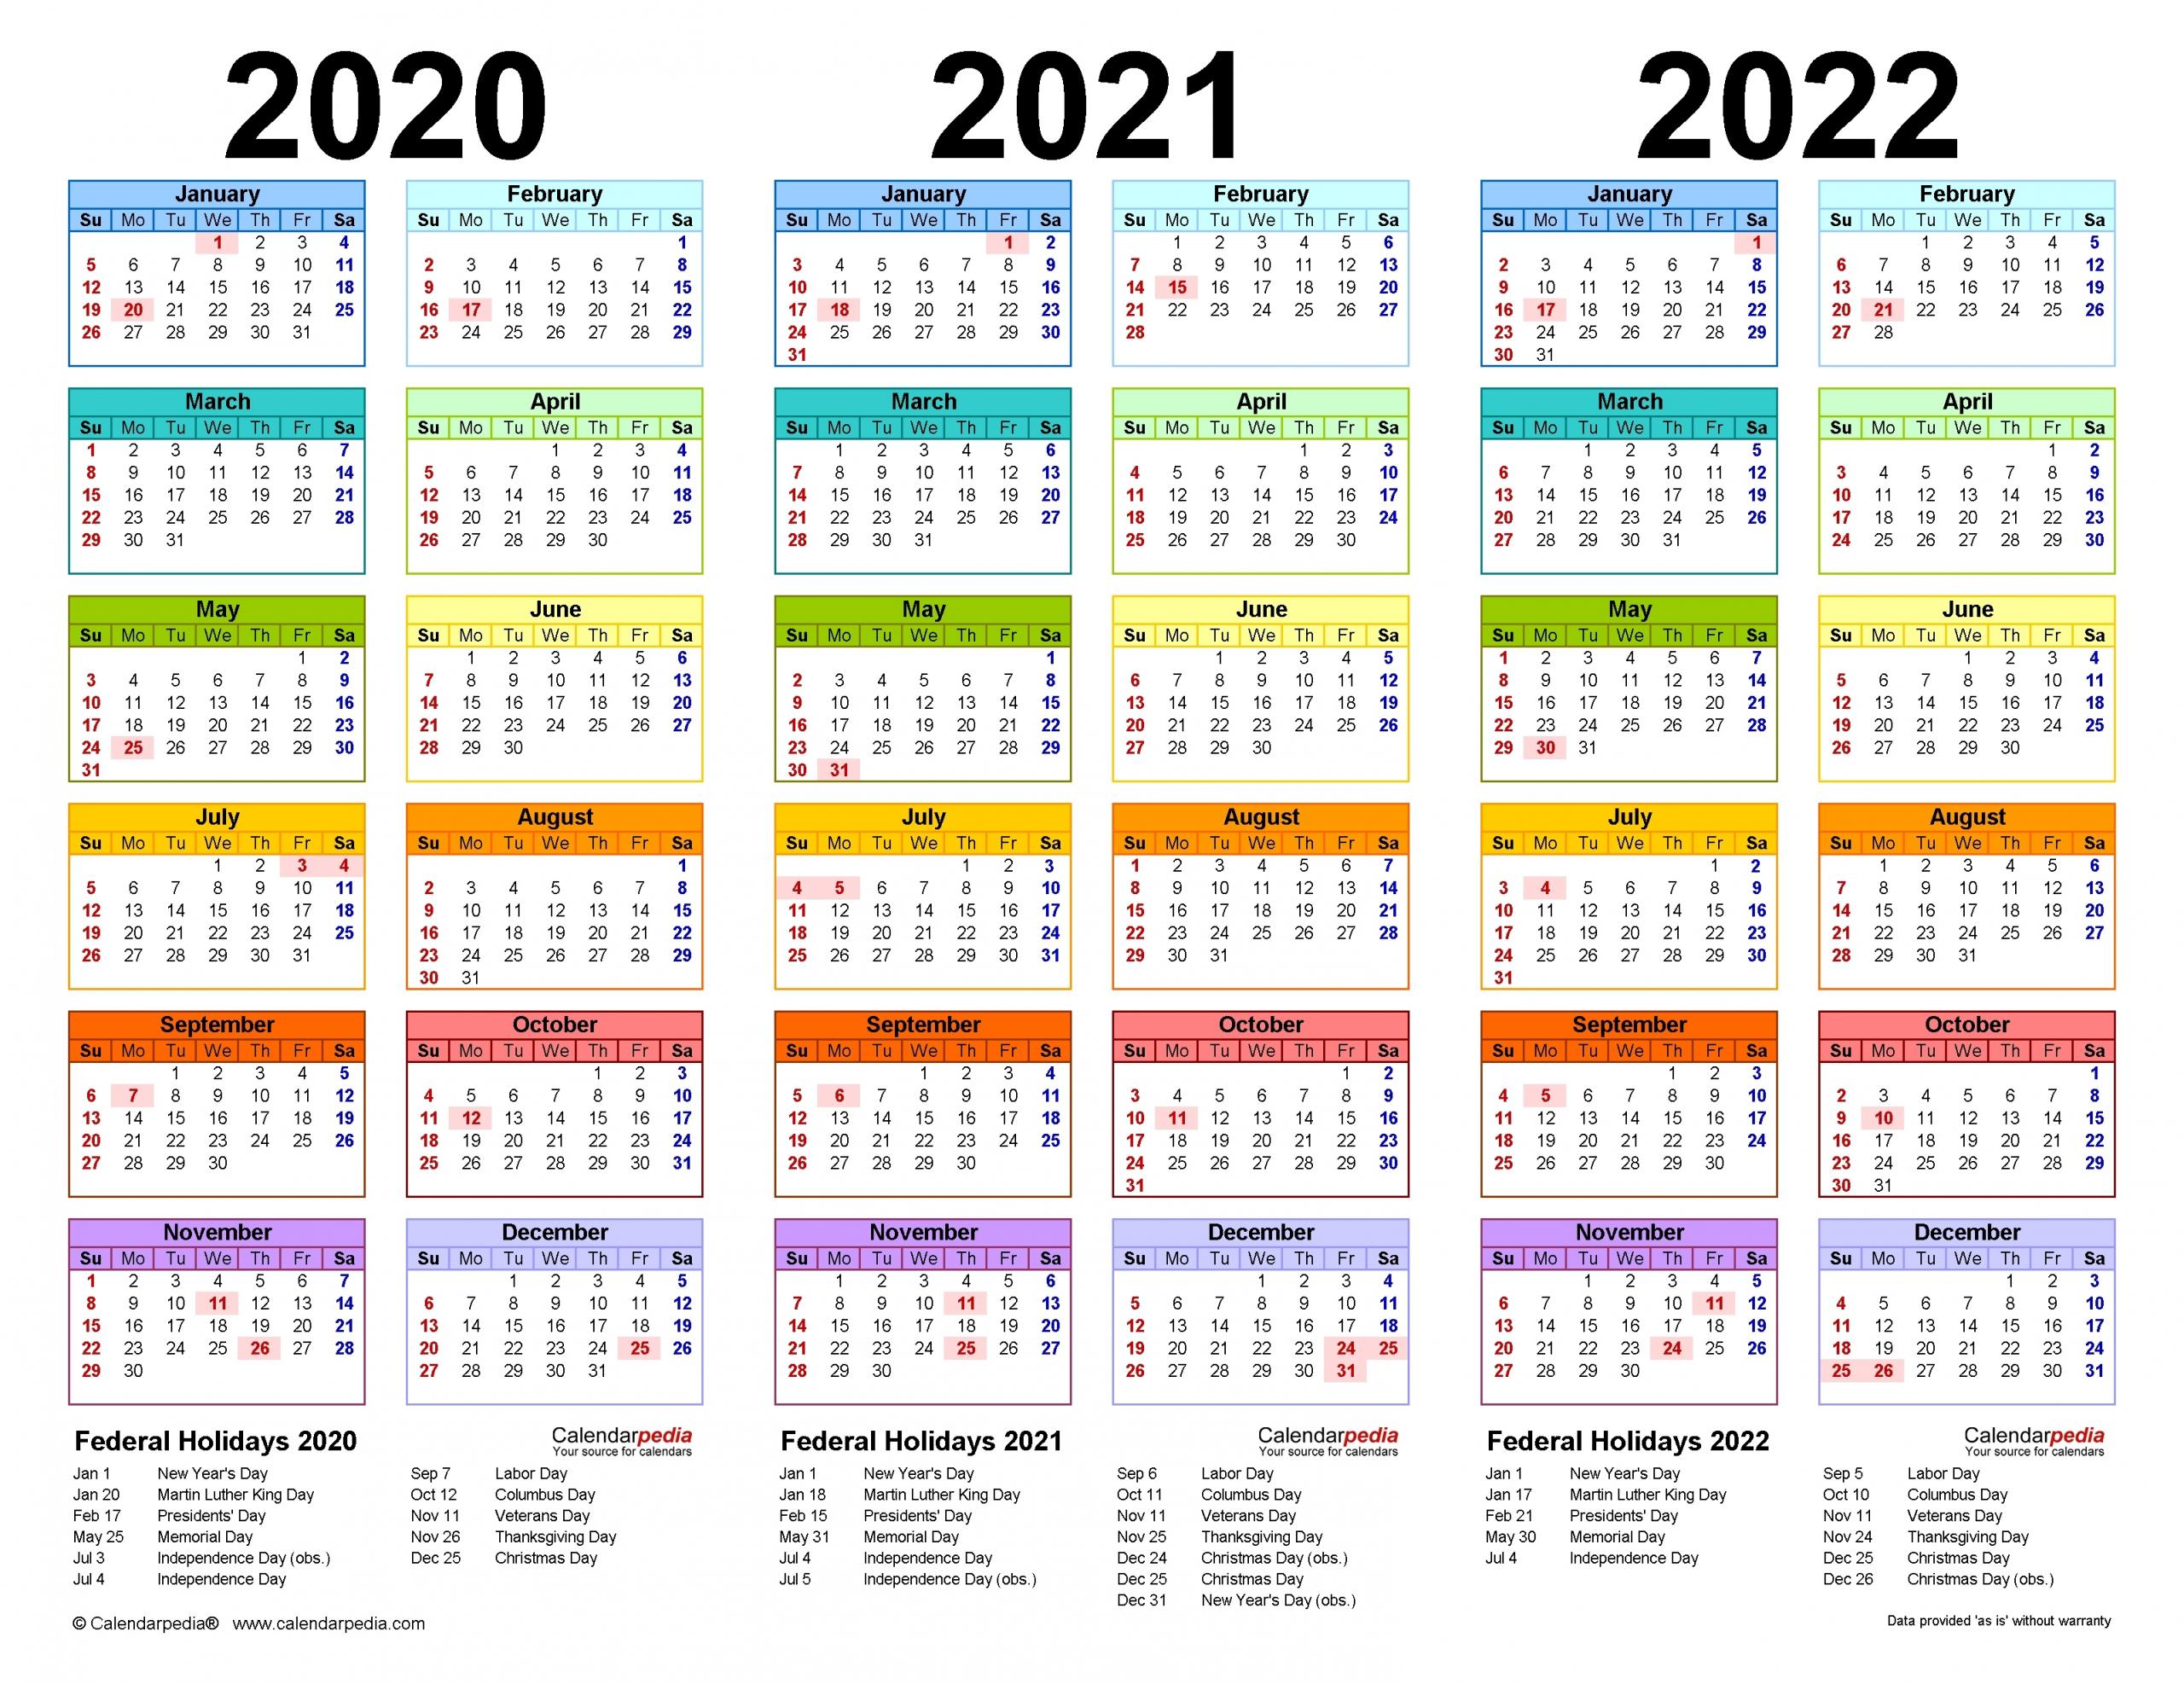 2020 2021 2022 2023 Calendar Printable One Page - Calendar Inspiration Design pertaining to 3 Year Printable Calendar 2021 2021 2022 Graphics